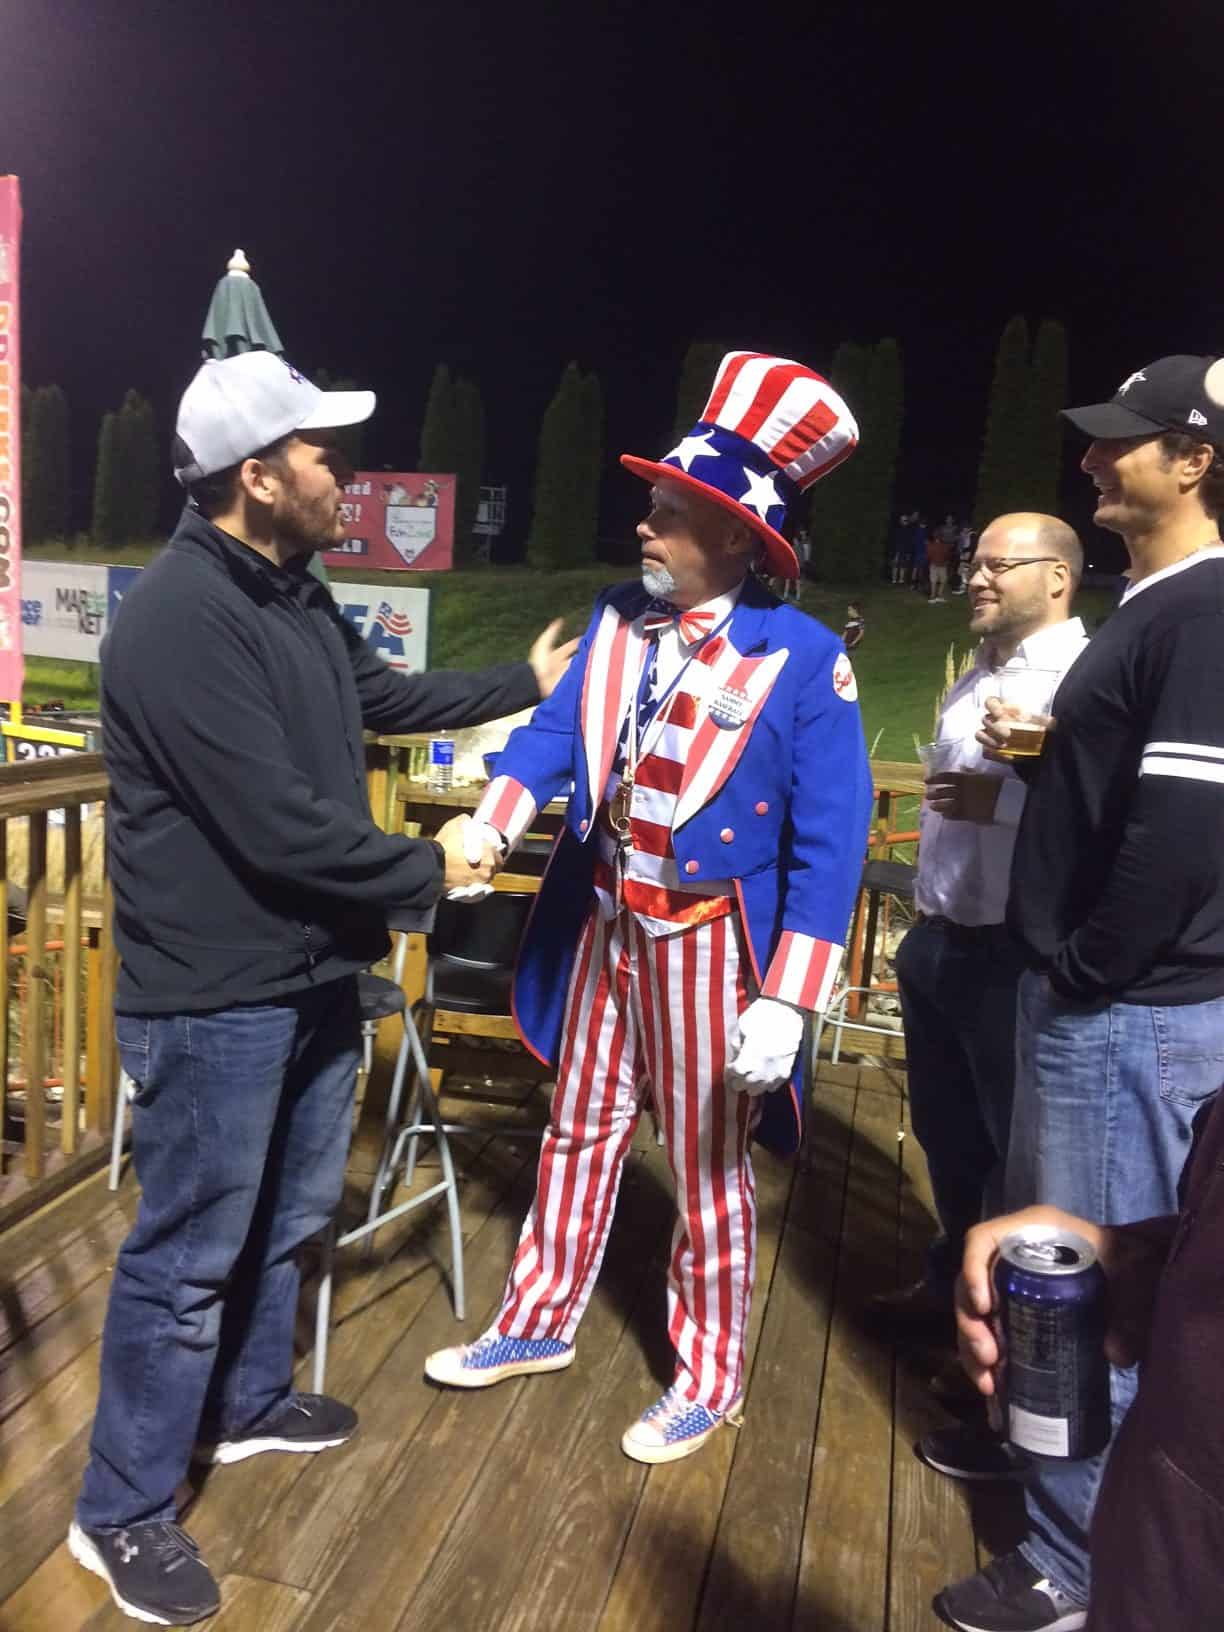 8/31/17: Alliance Team Enjoys Tri-City Valley Cats Baseball Game